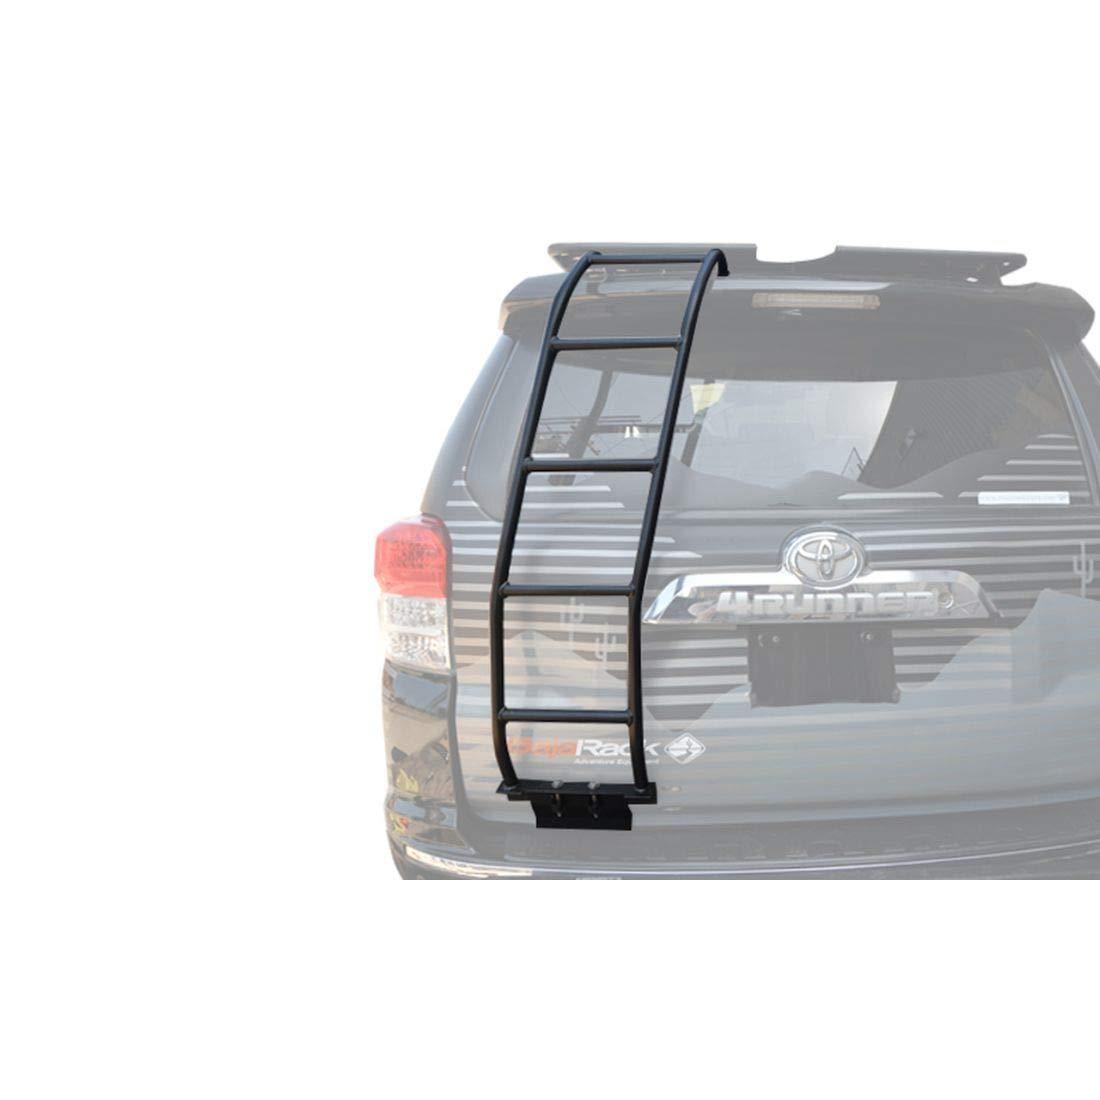 BajaRack Rear Ladder Toyota 2010-2018 4Runner Gen 5